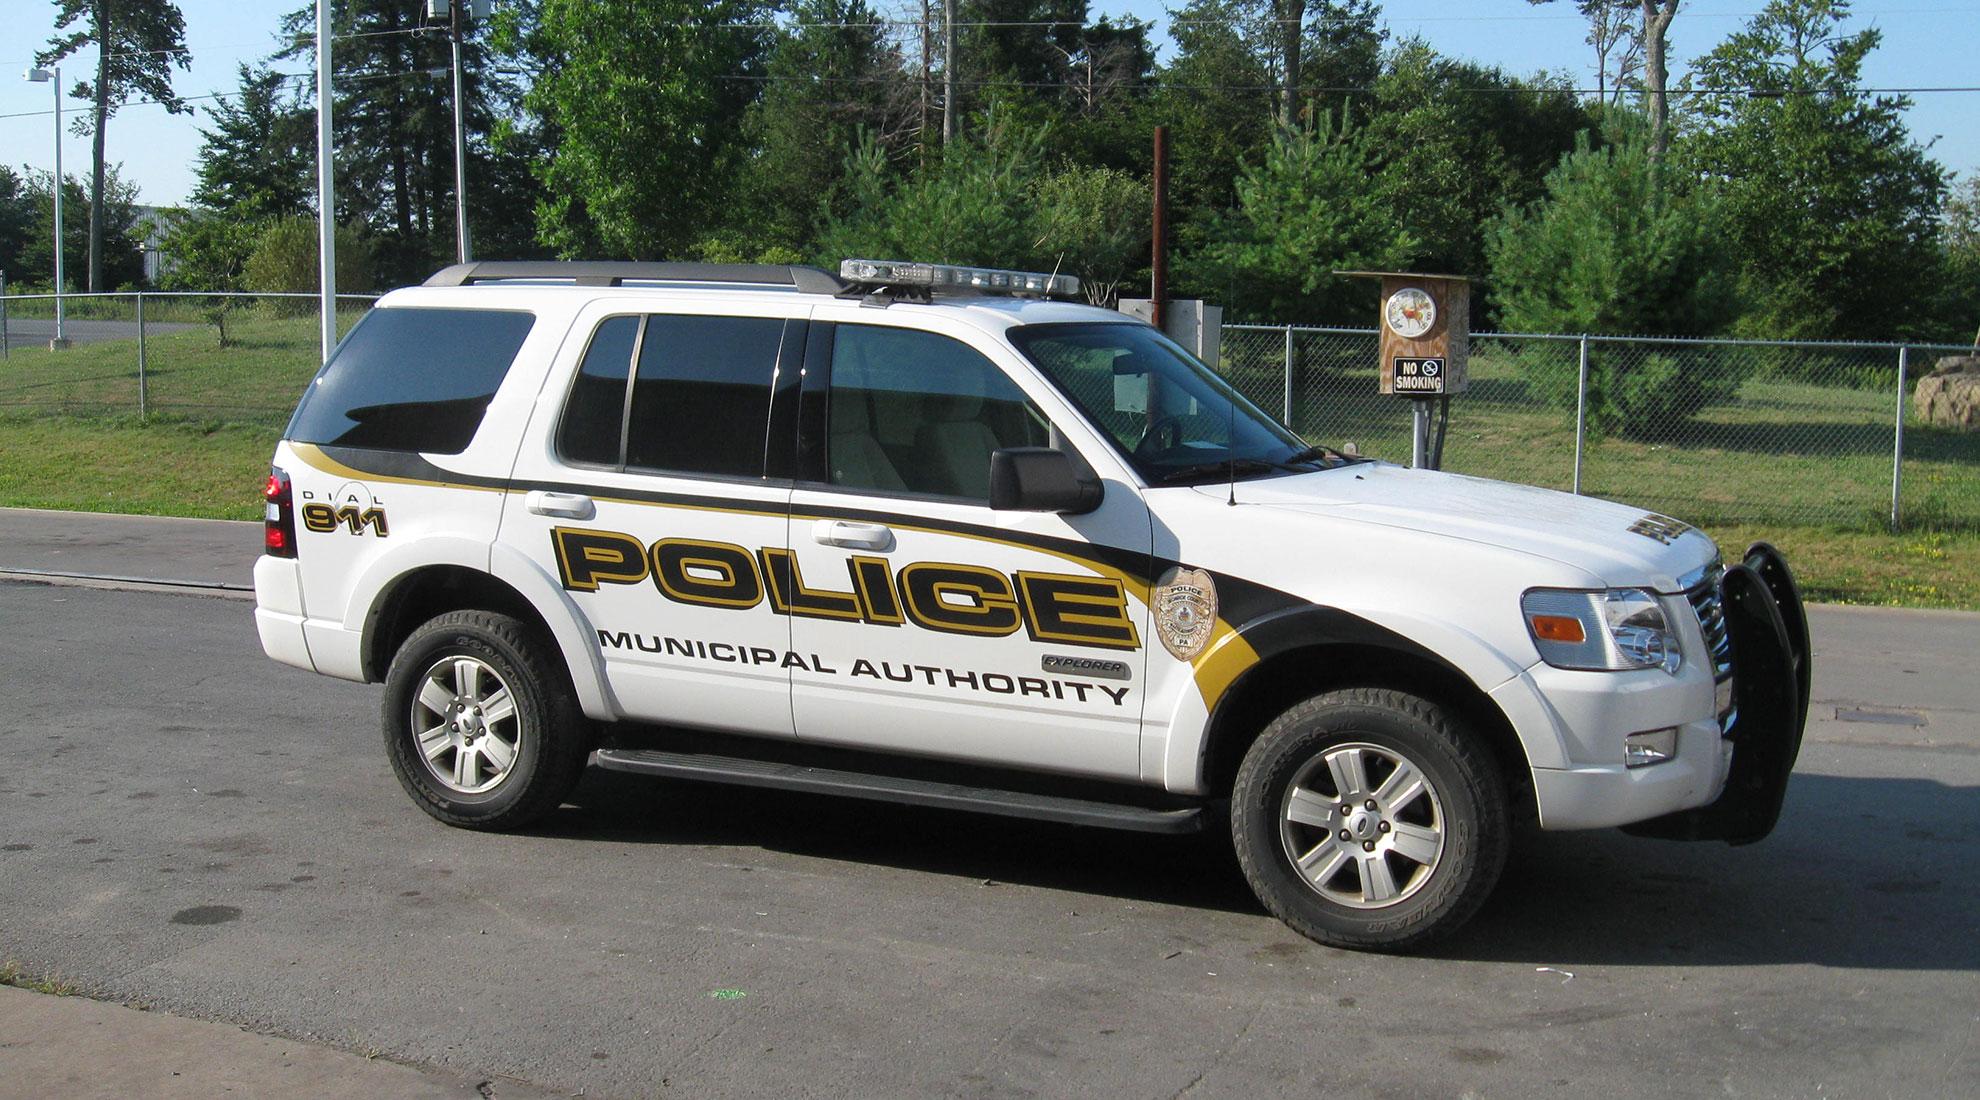 Police Enforcement Vehicle